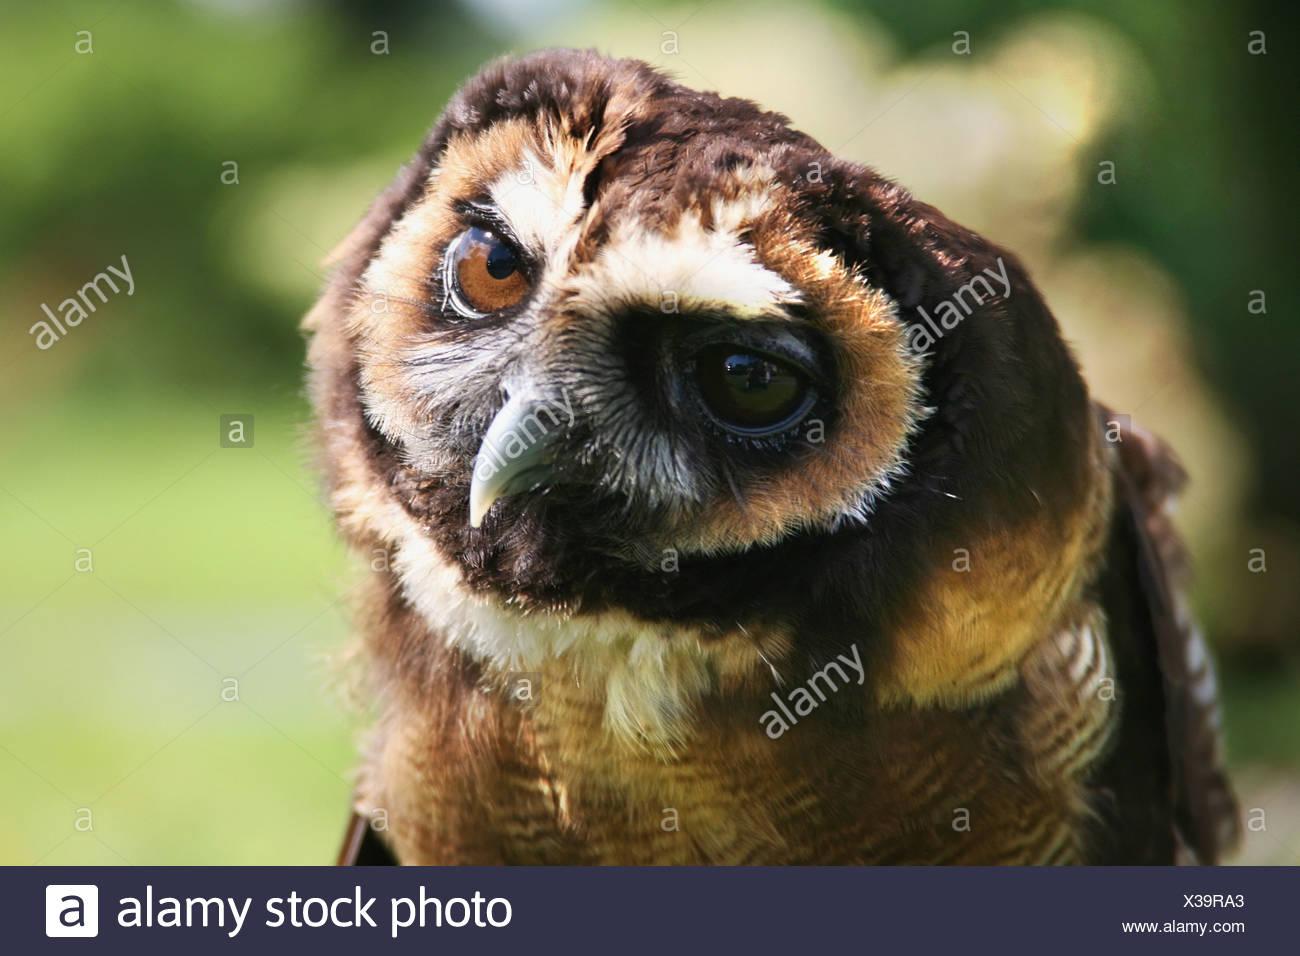 Russian Owl; Windermere,Cumbria, England - Stock Image